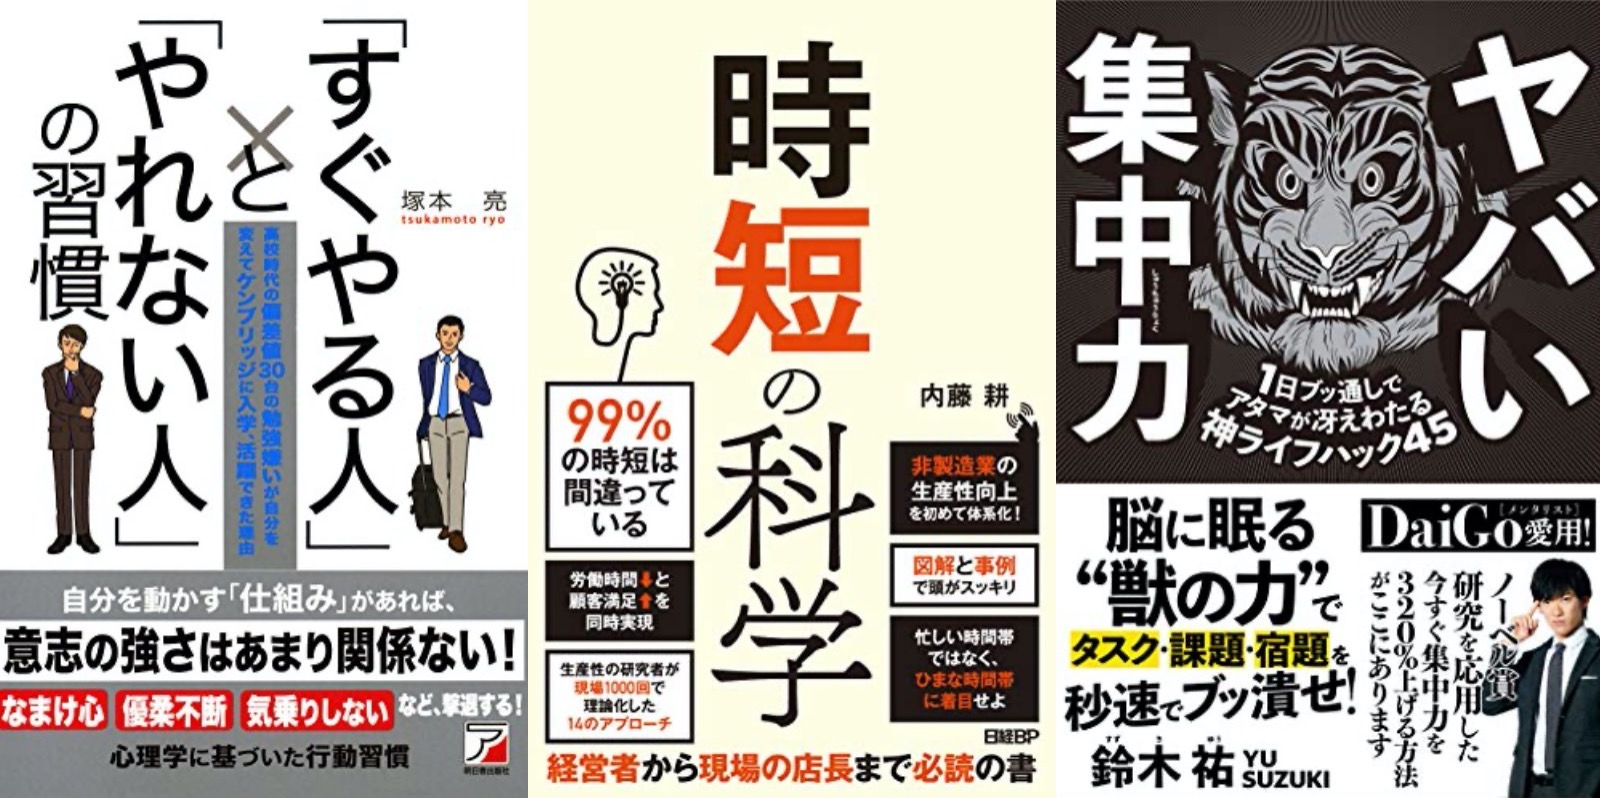 Kindle Cashback campaign max 20percent